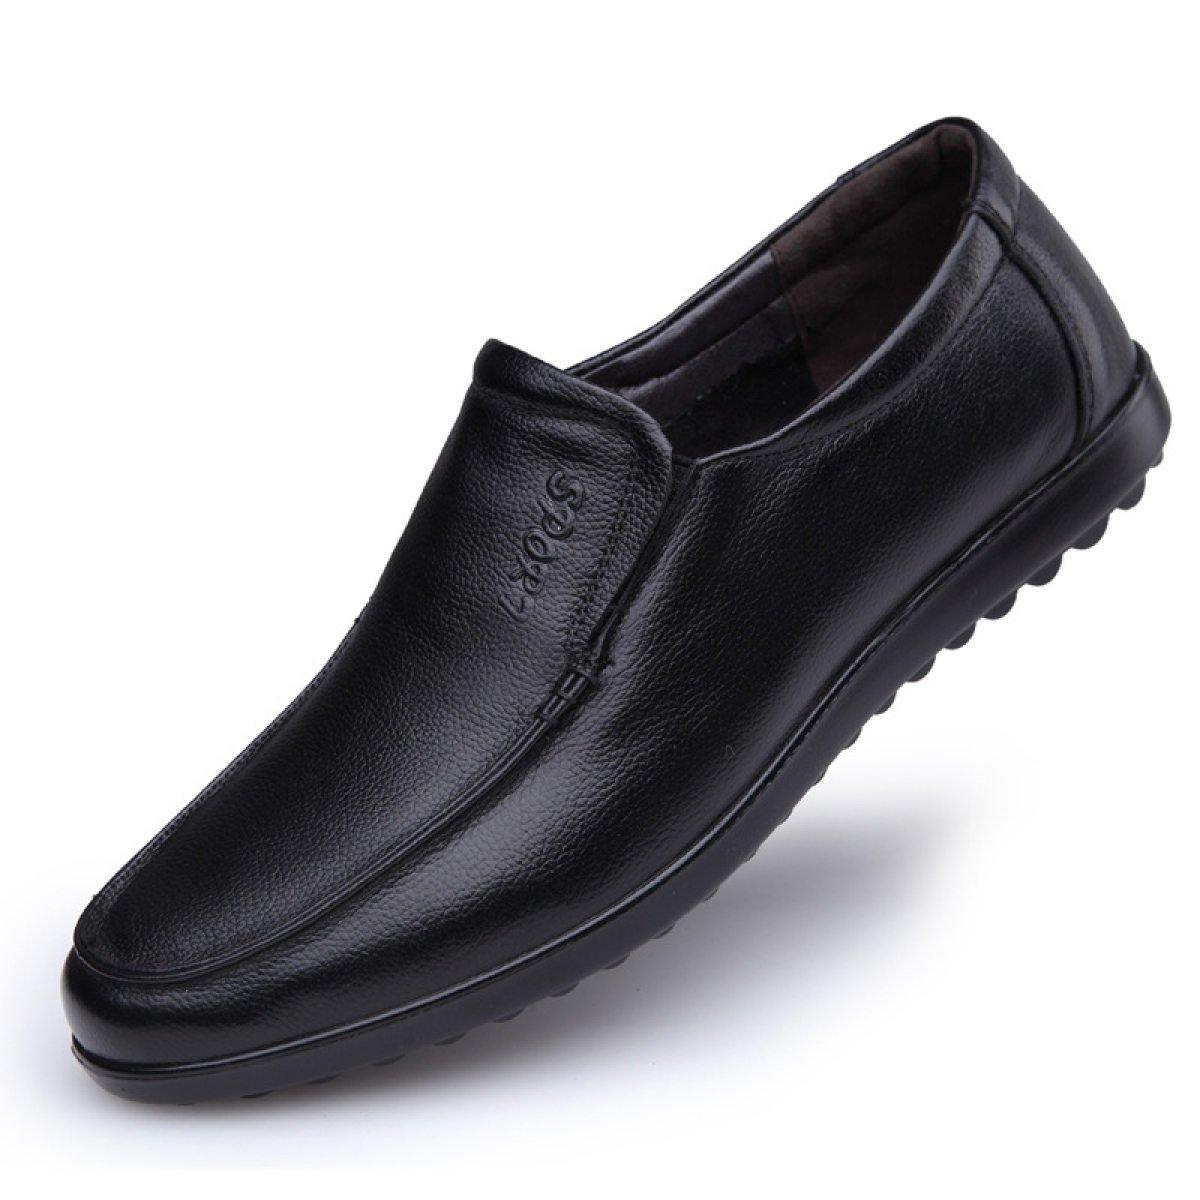 Männer Alters Männer Freizeitschuhe Leder Weichen Boden Schuhe Mittleren Alters Männer Papa Schuhe Baumwollschuhe schwarz ee00d1